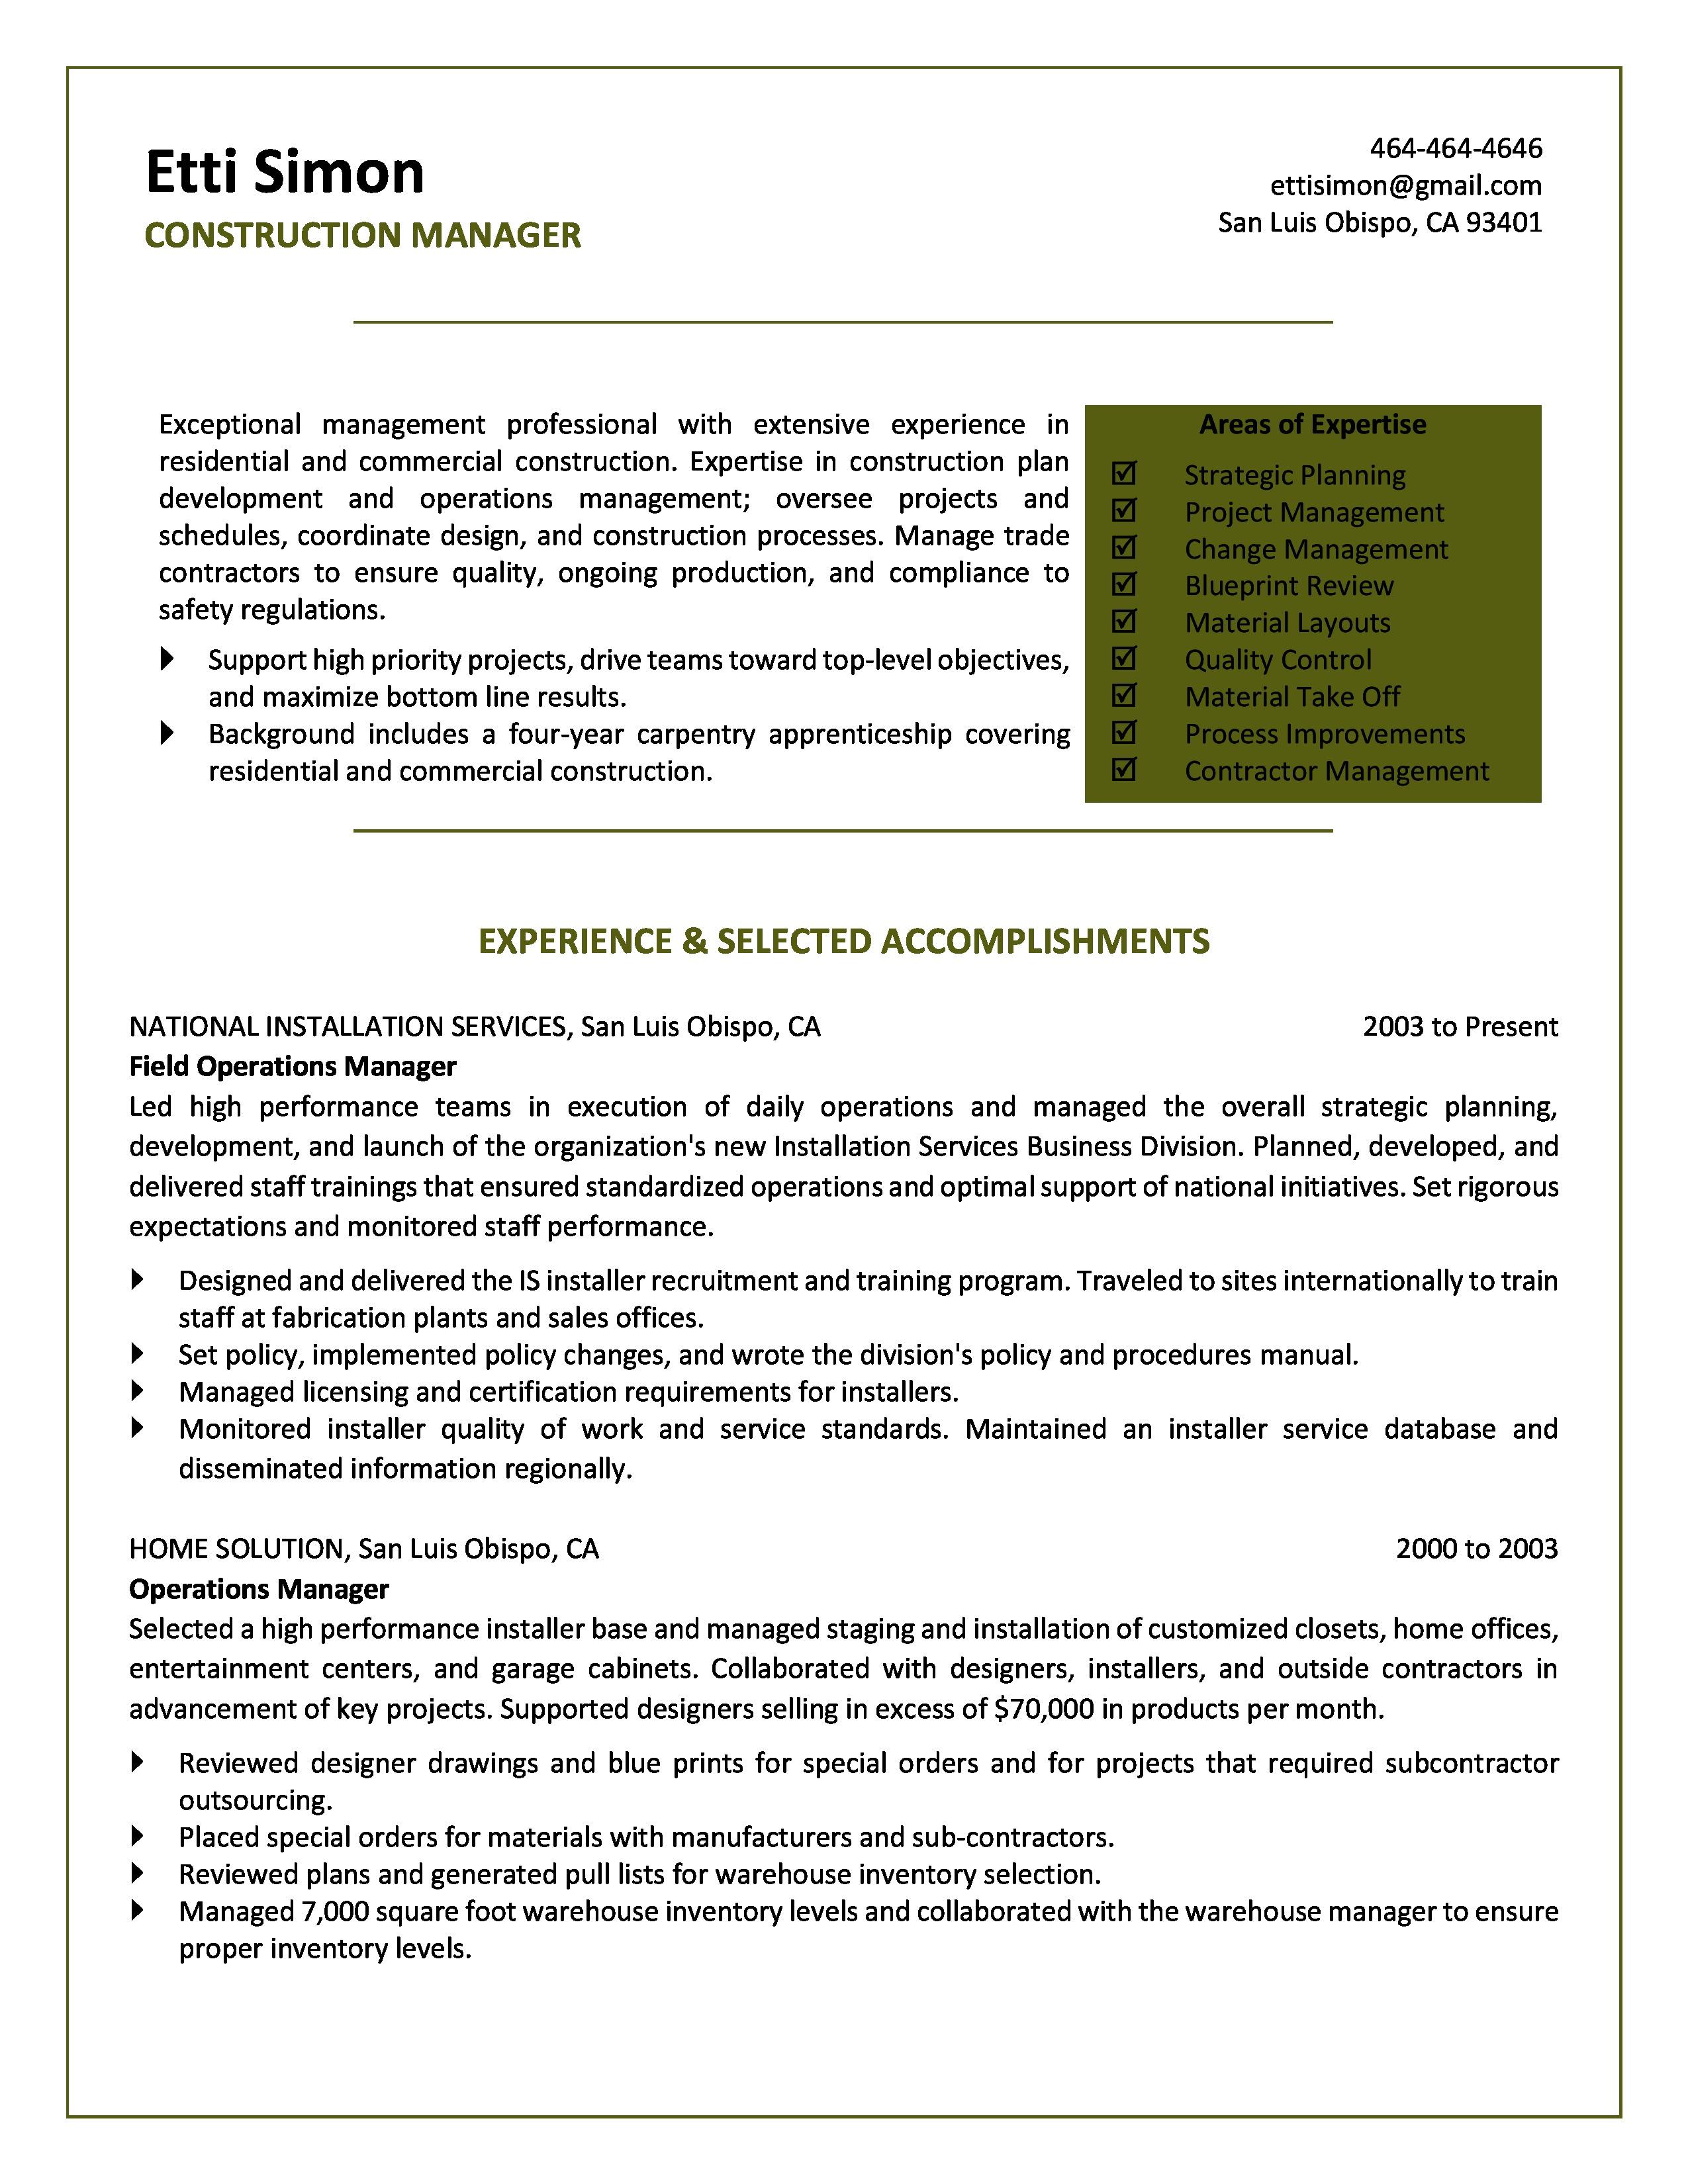 essential professional mid career resume package a vita career